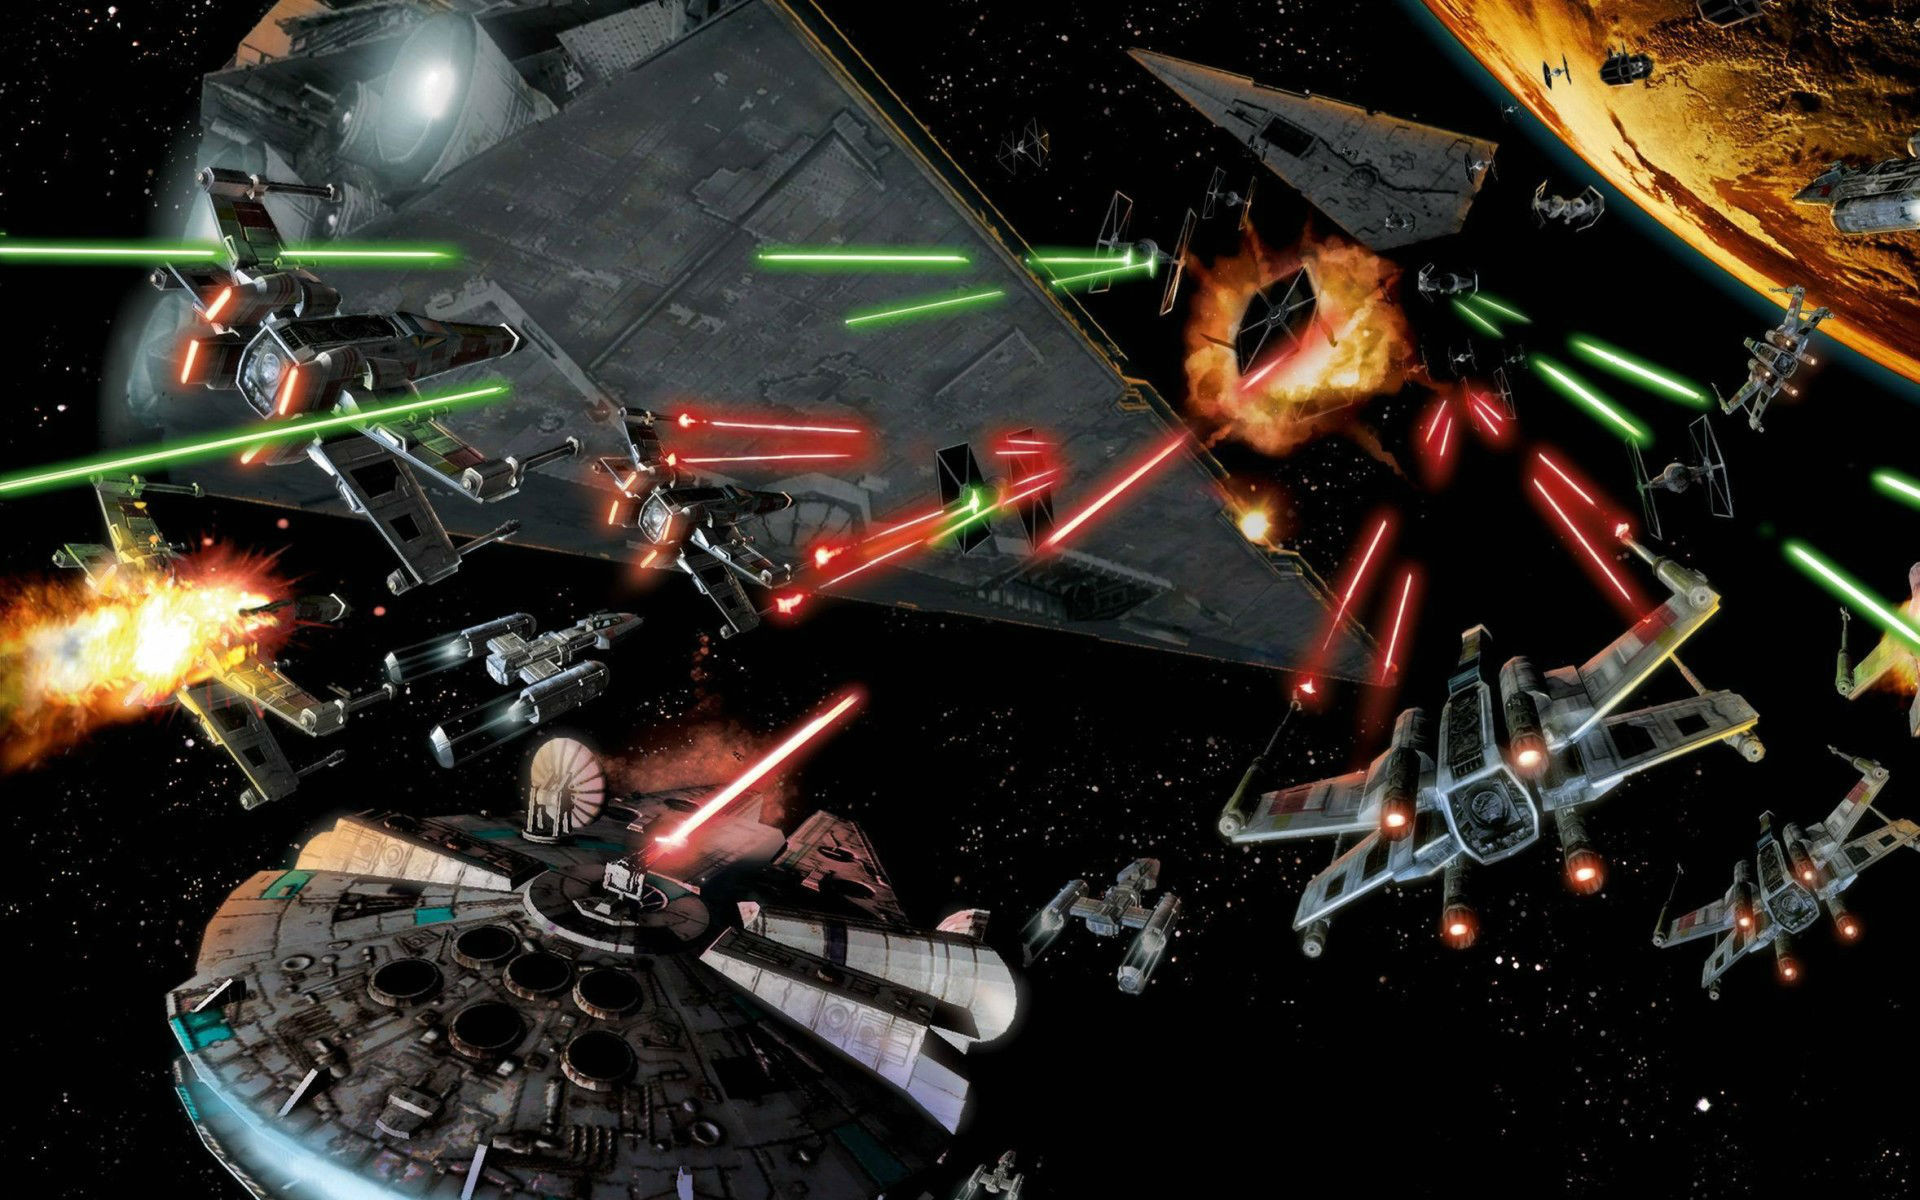 370 best Star Wars images on Pinterest   Star wars art, Star wars stuff and  Star trek